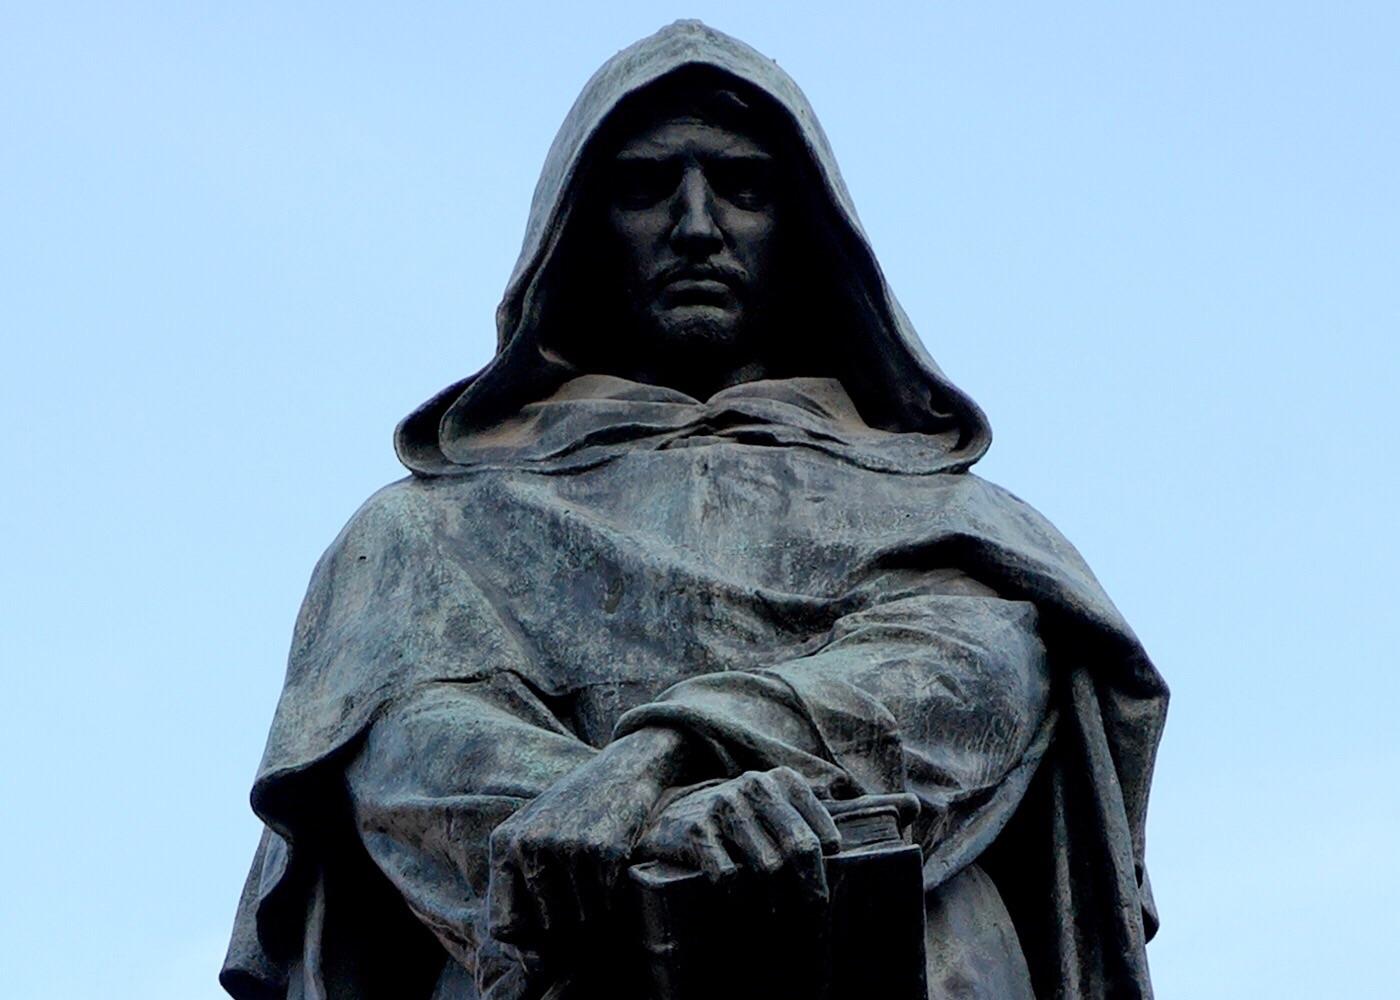 Estatua de Giordano Bruno por Ettore Ferrari.